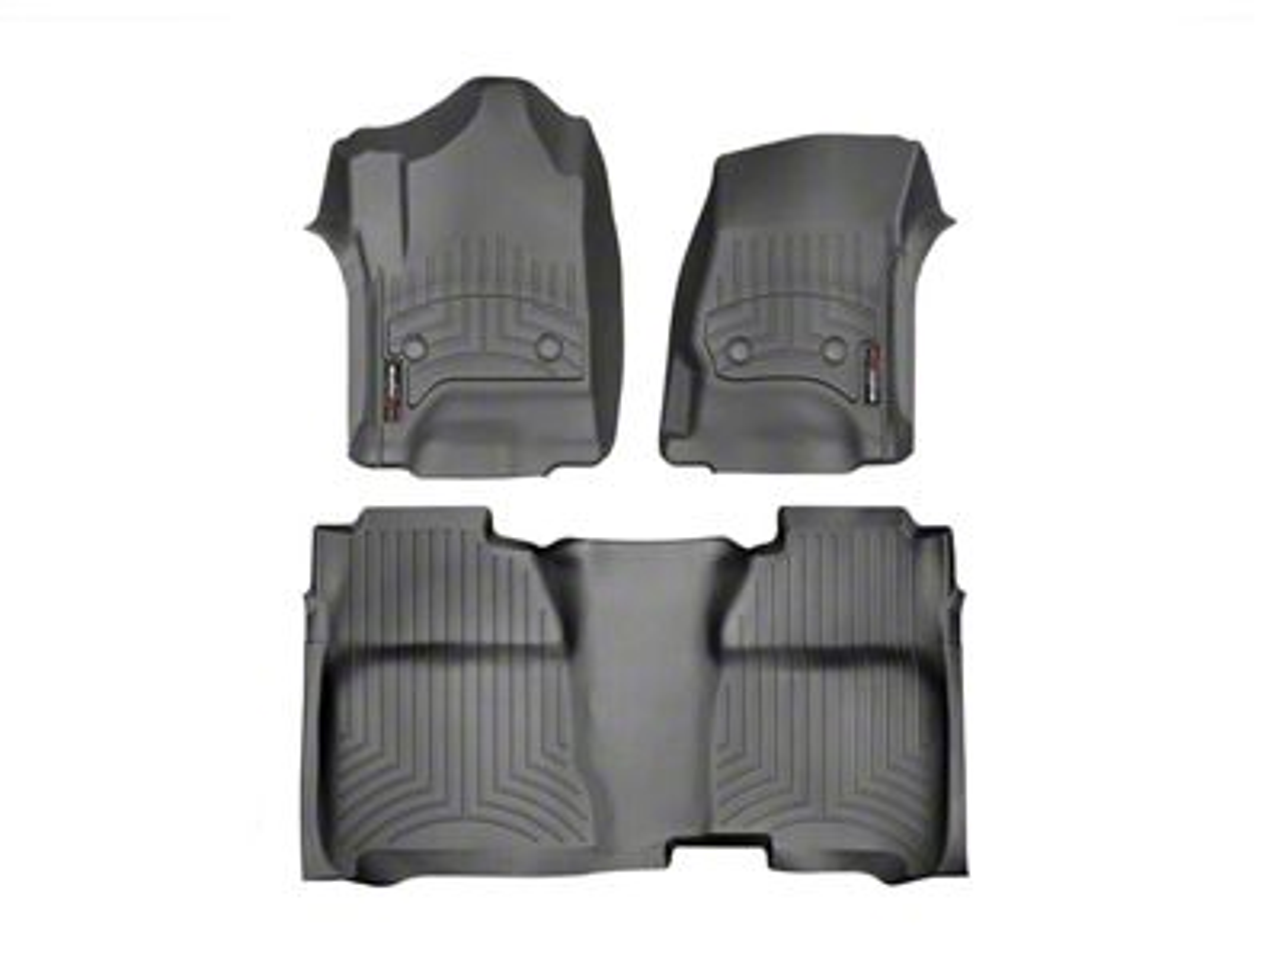 Weathertech DigitalFit Front & Rear Floor Liners w/ Underseat Coverage - Black (14-18 Sierra 1500 Crew Cab)